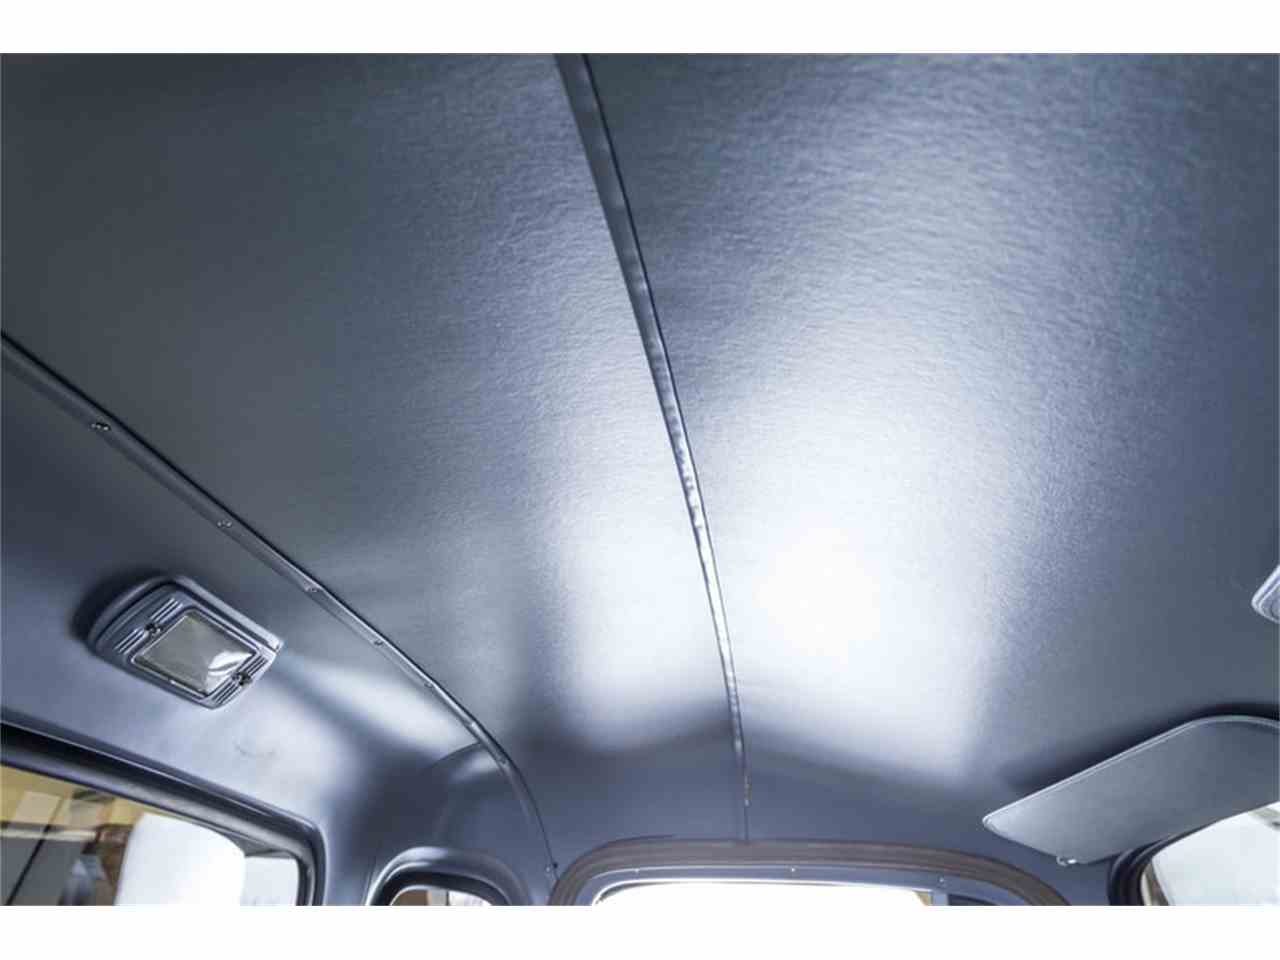 Large Picture of Classic '55 3100 5 Window Deluxe Pickup - $43,900.00 - JUIZ